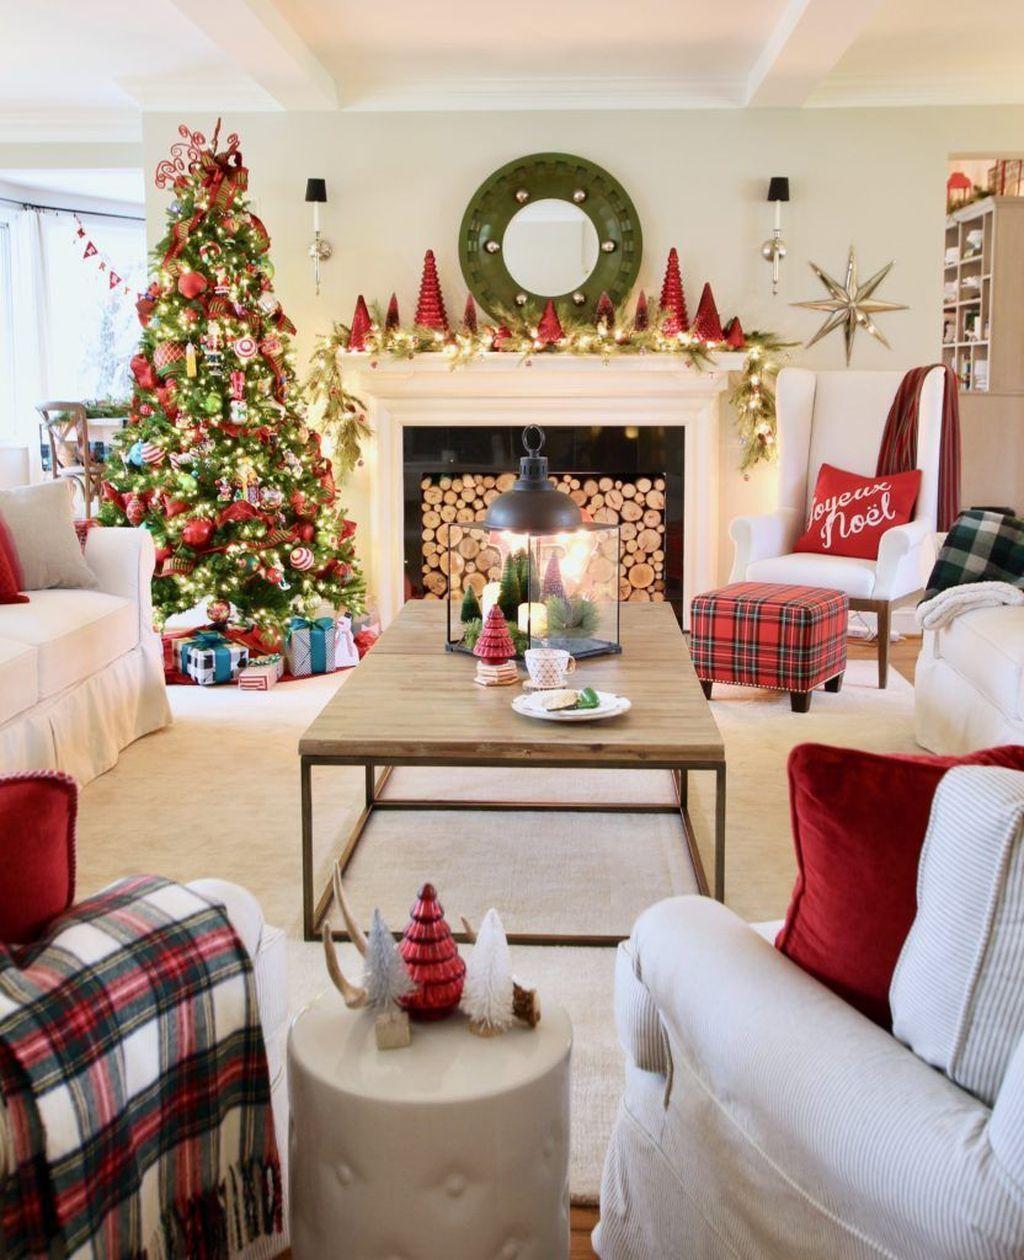 55 Small Apartment Christmas Tree Living Room Decor Ideas #smallapartmentchristmasdecor